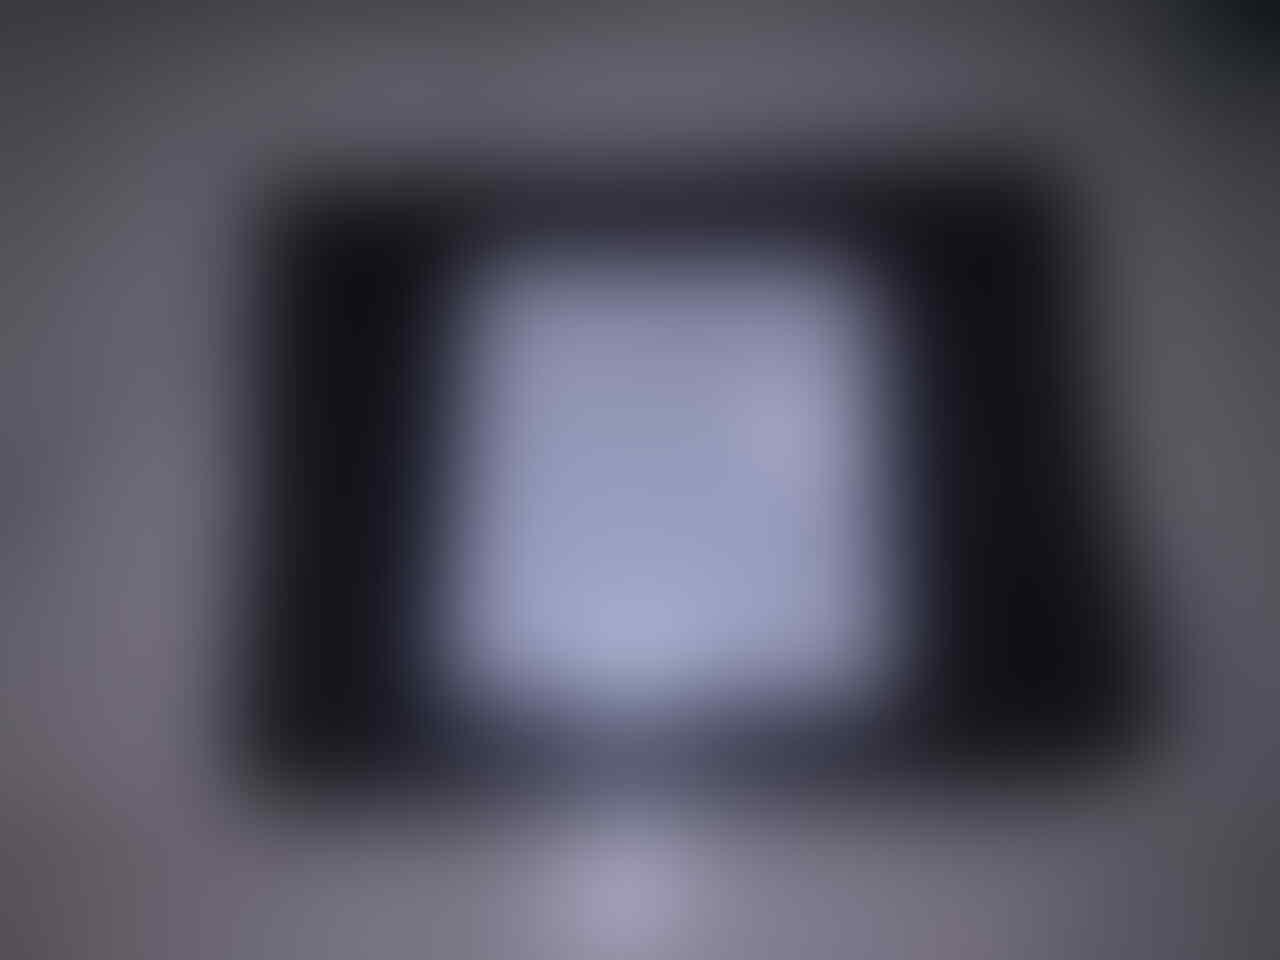 ## VLC ## HEADSET KEENION KOS 807, 809, 220, 803, TERMURAHHHHH